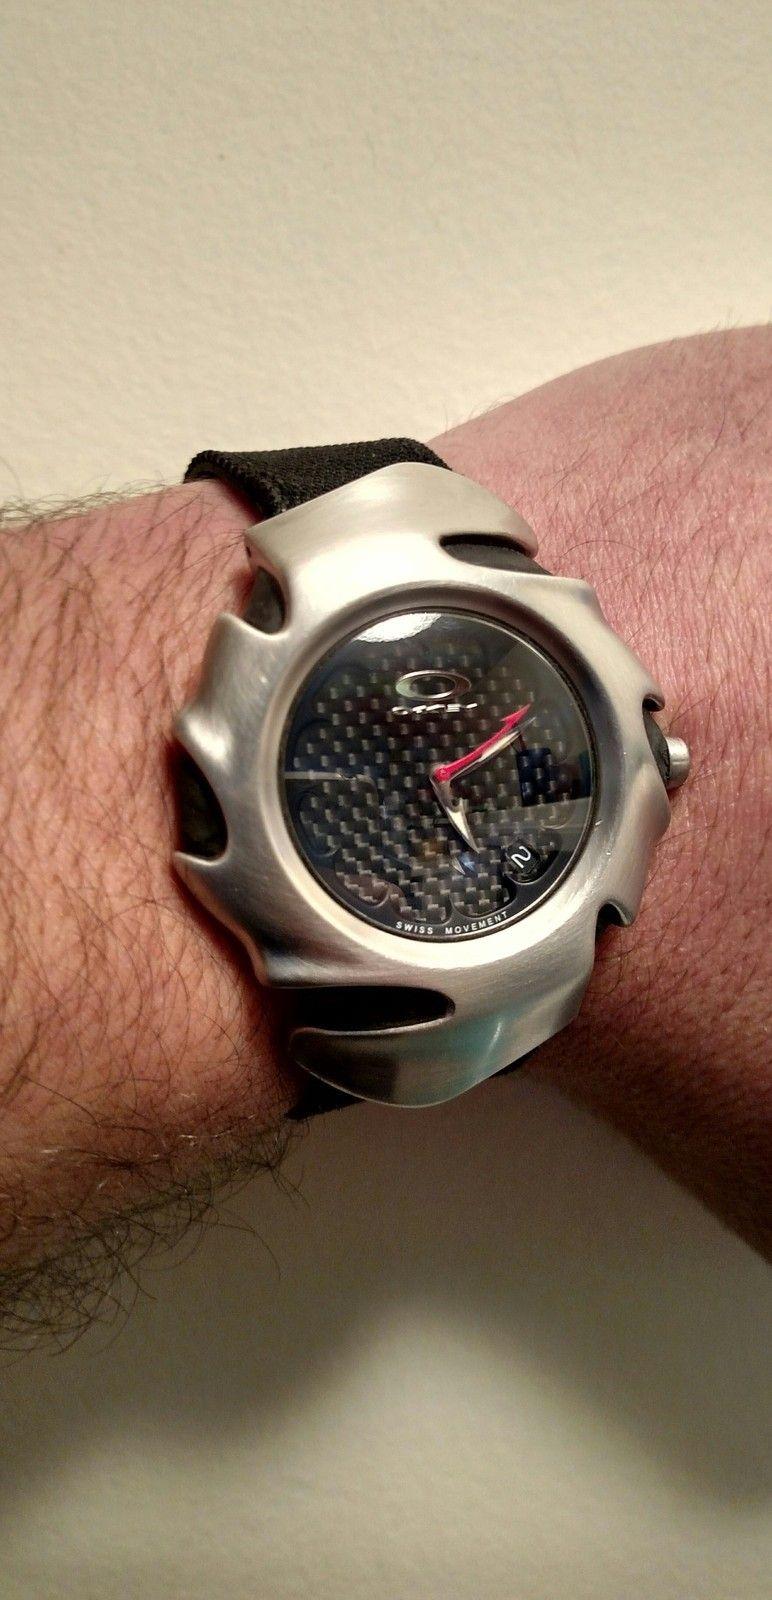 1st Watch - IMG_20150302_171656.jpg